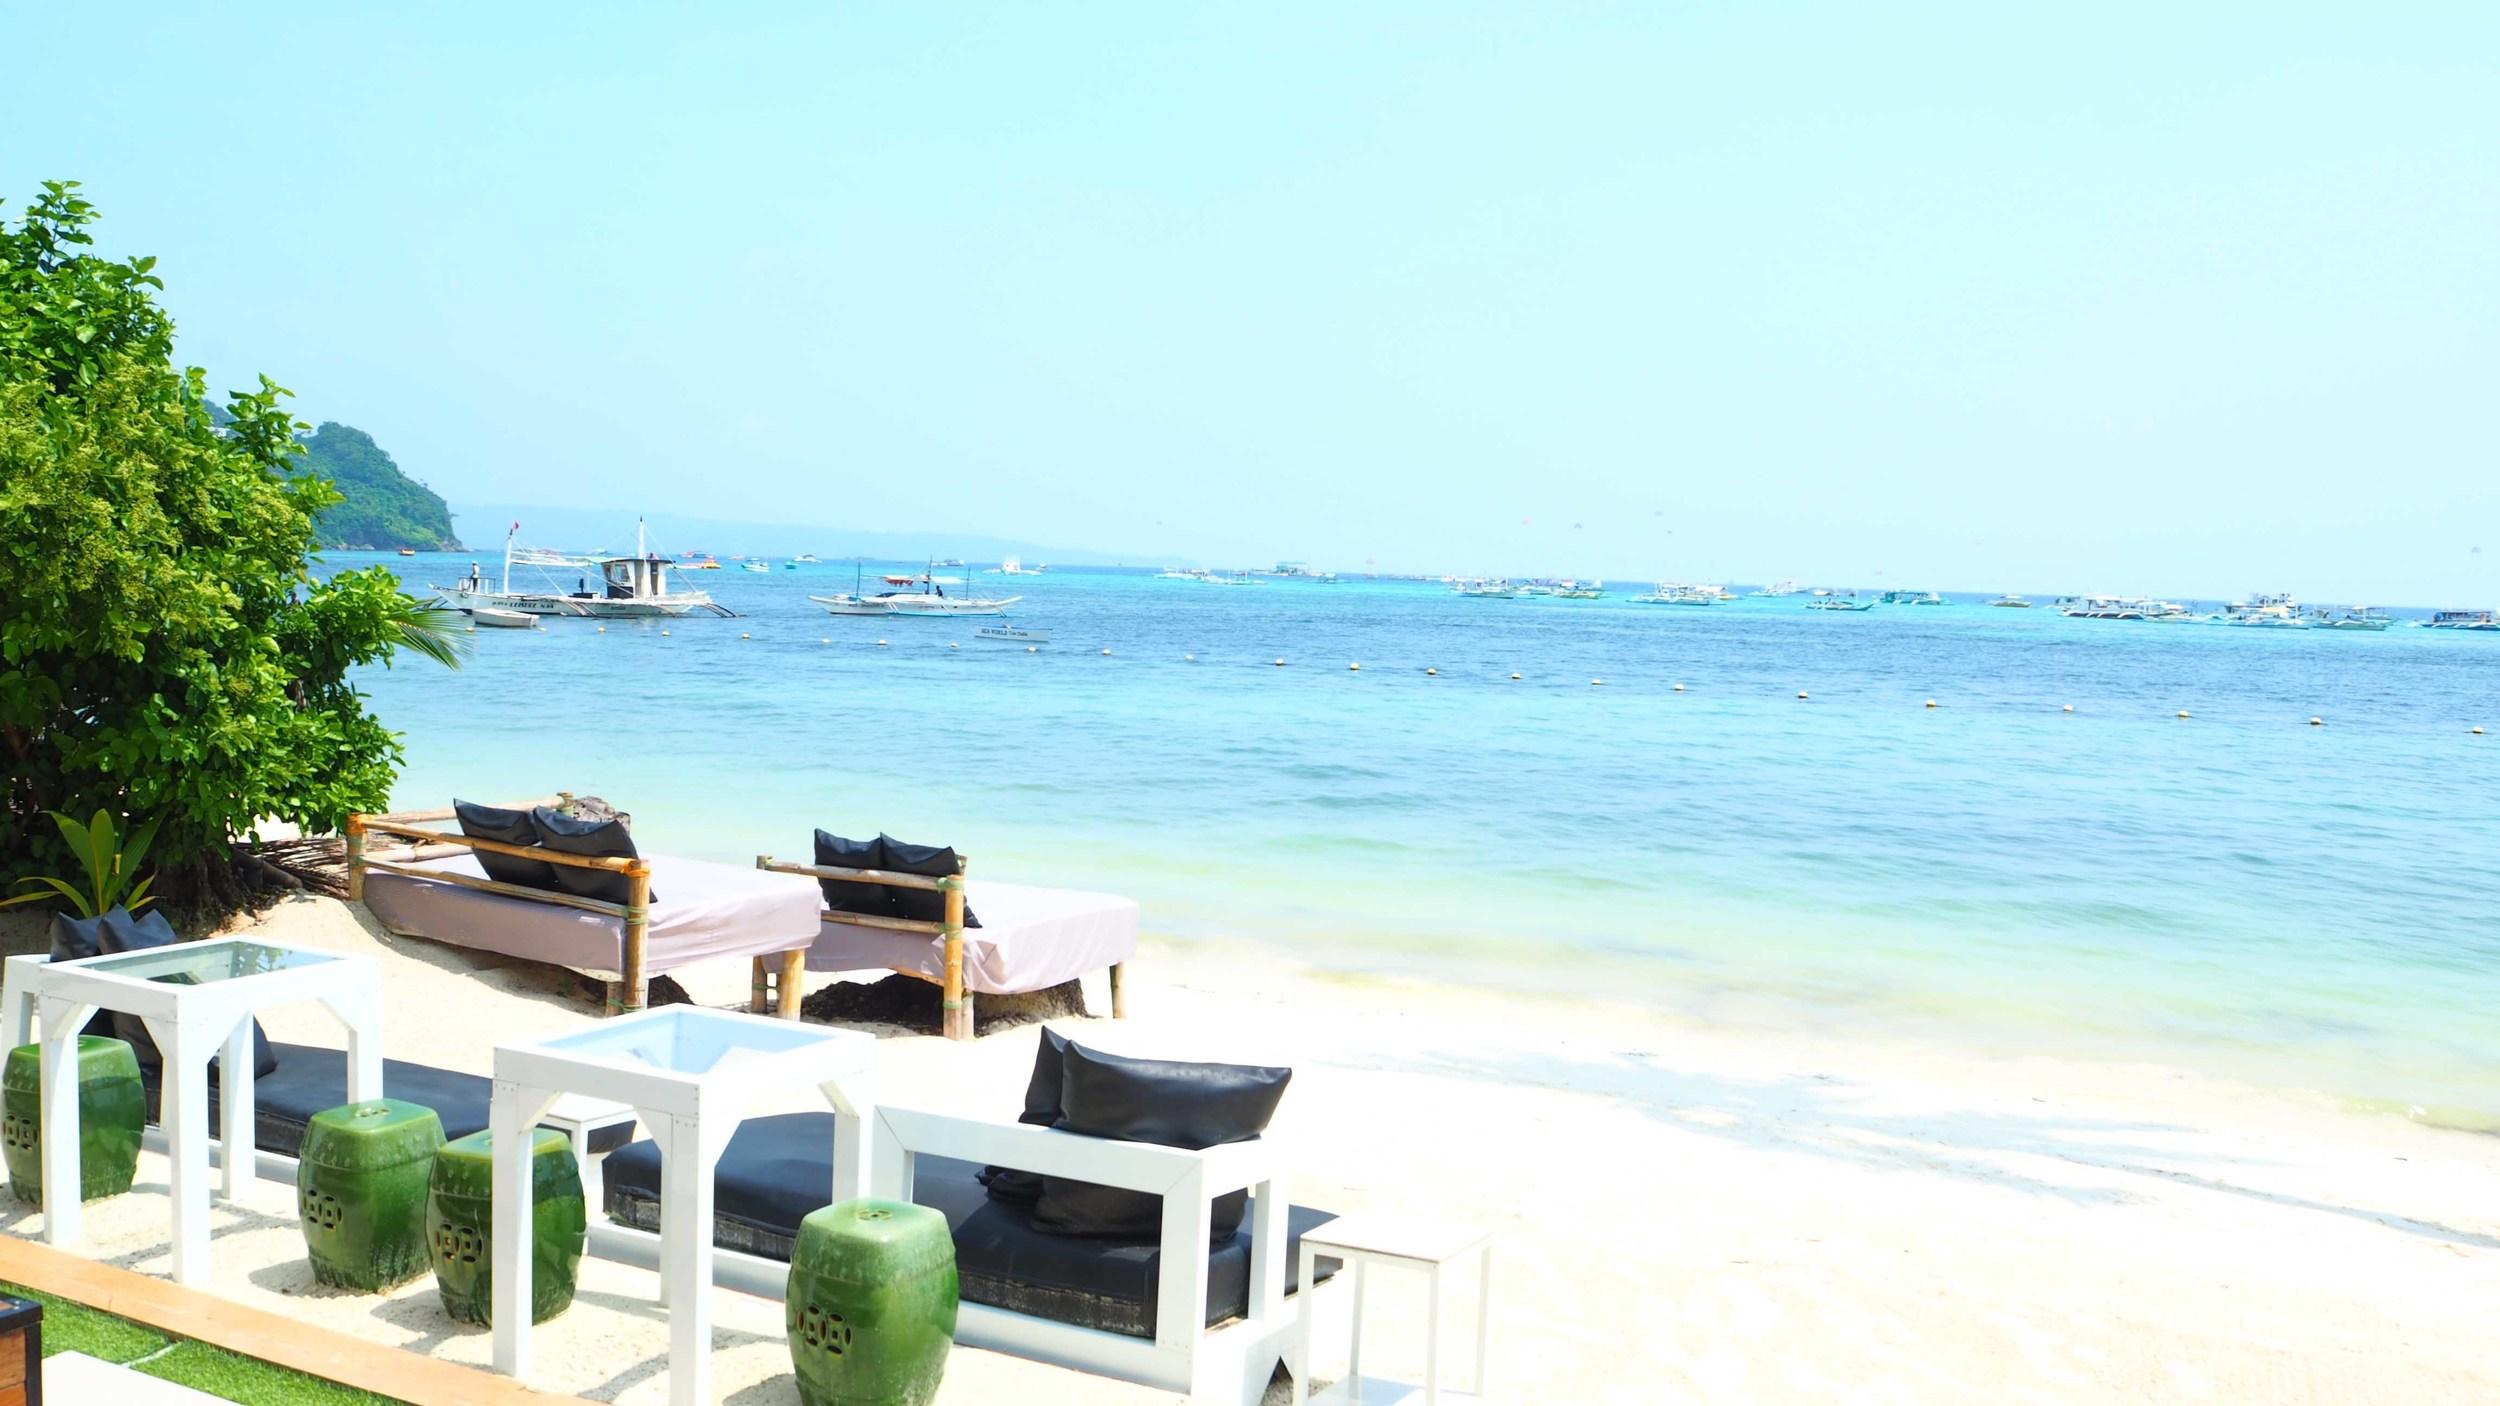 Boracay Beach Alexander Yuen